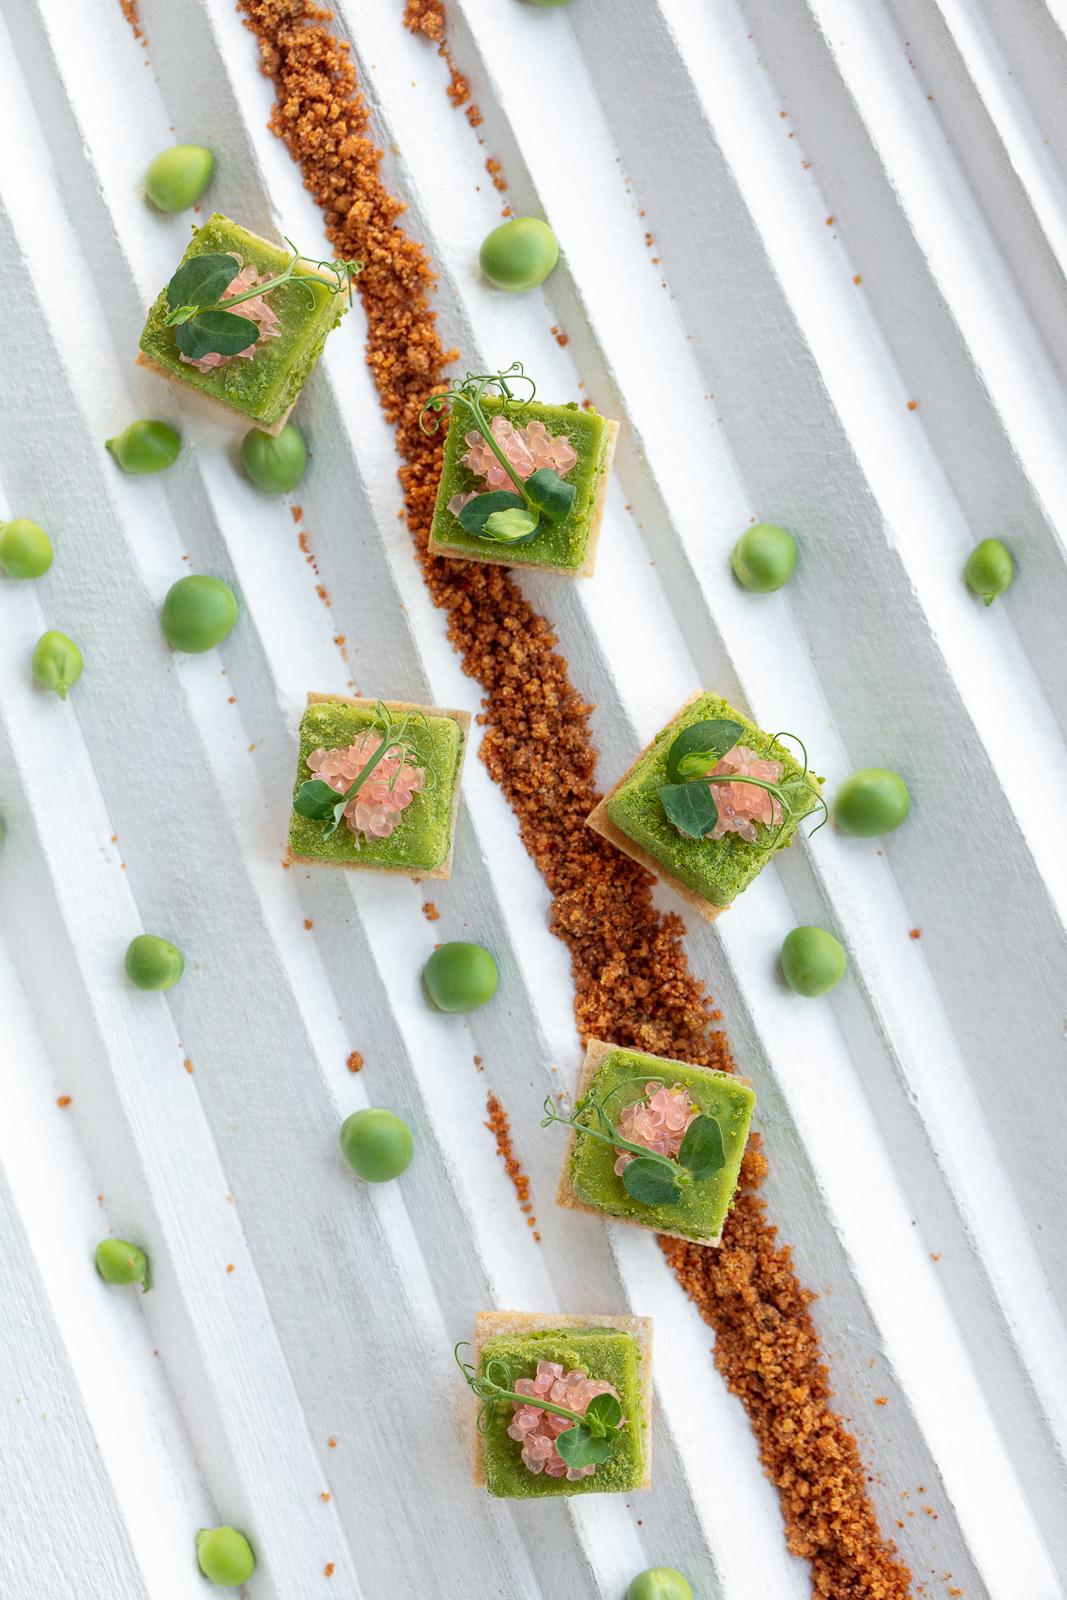 Franck_Hamel_food_photographer_photographeculinaire_valerie_paumelle_agent_st_clair_traiteur (8).jpg